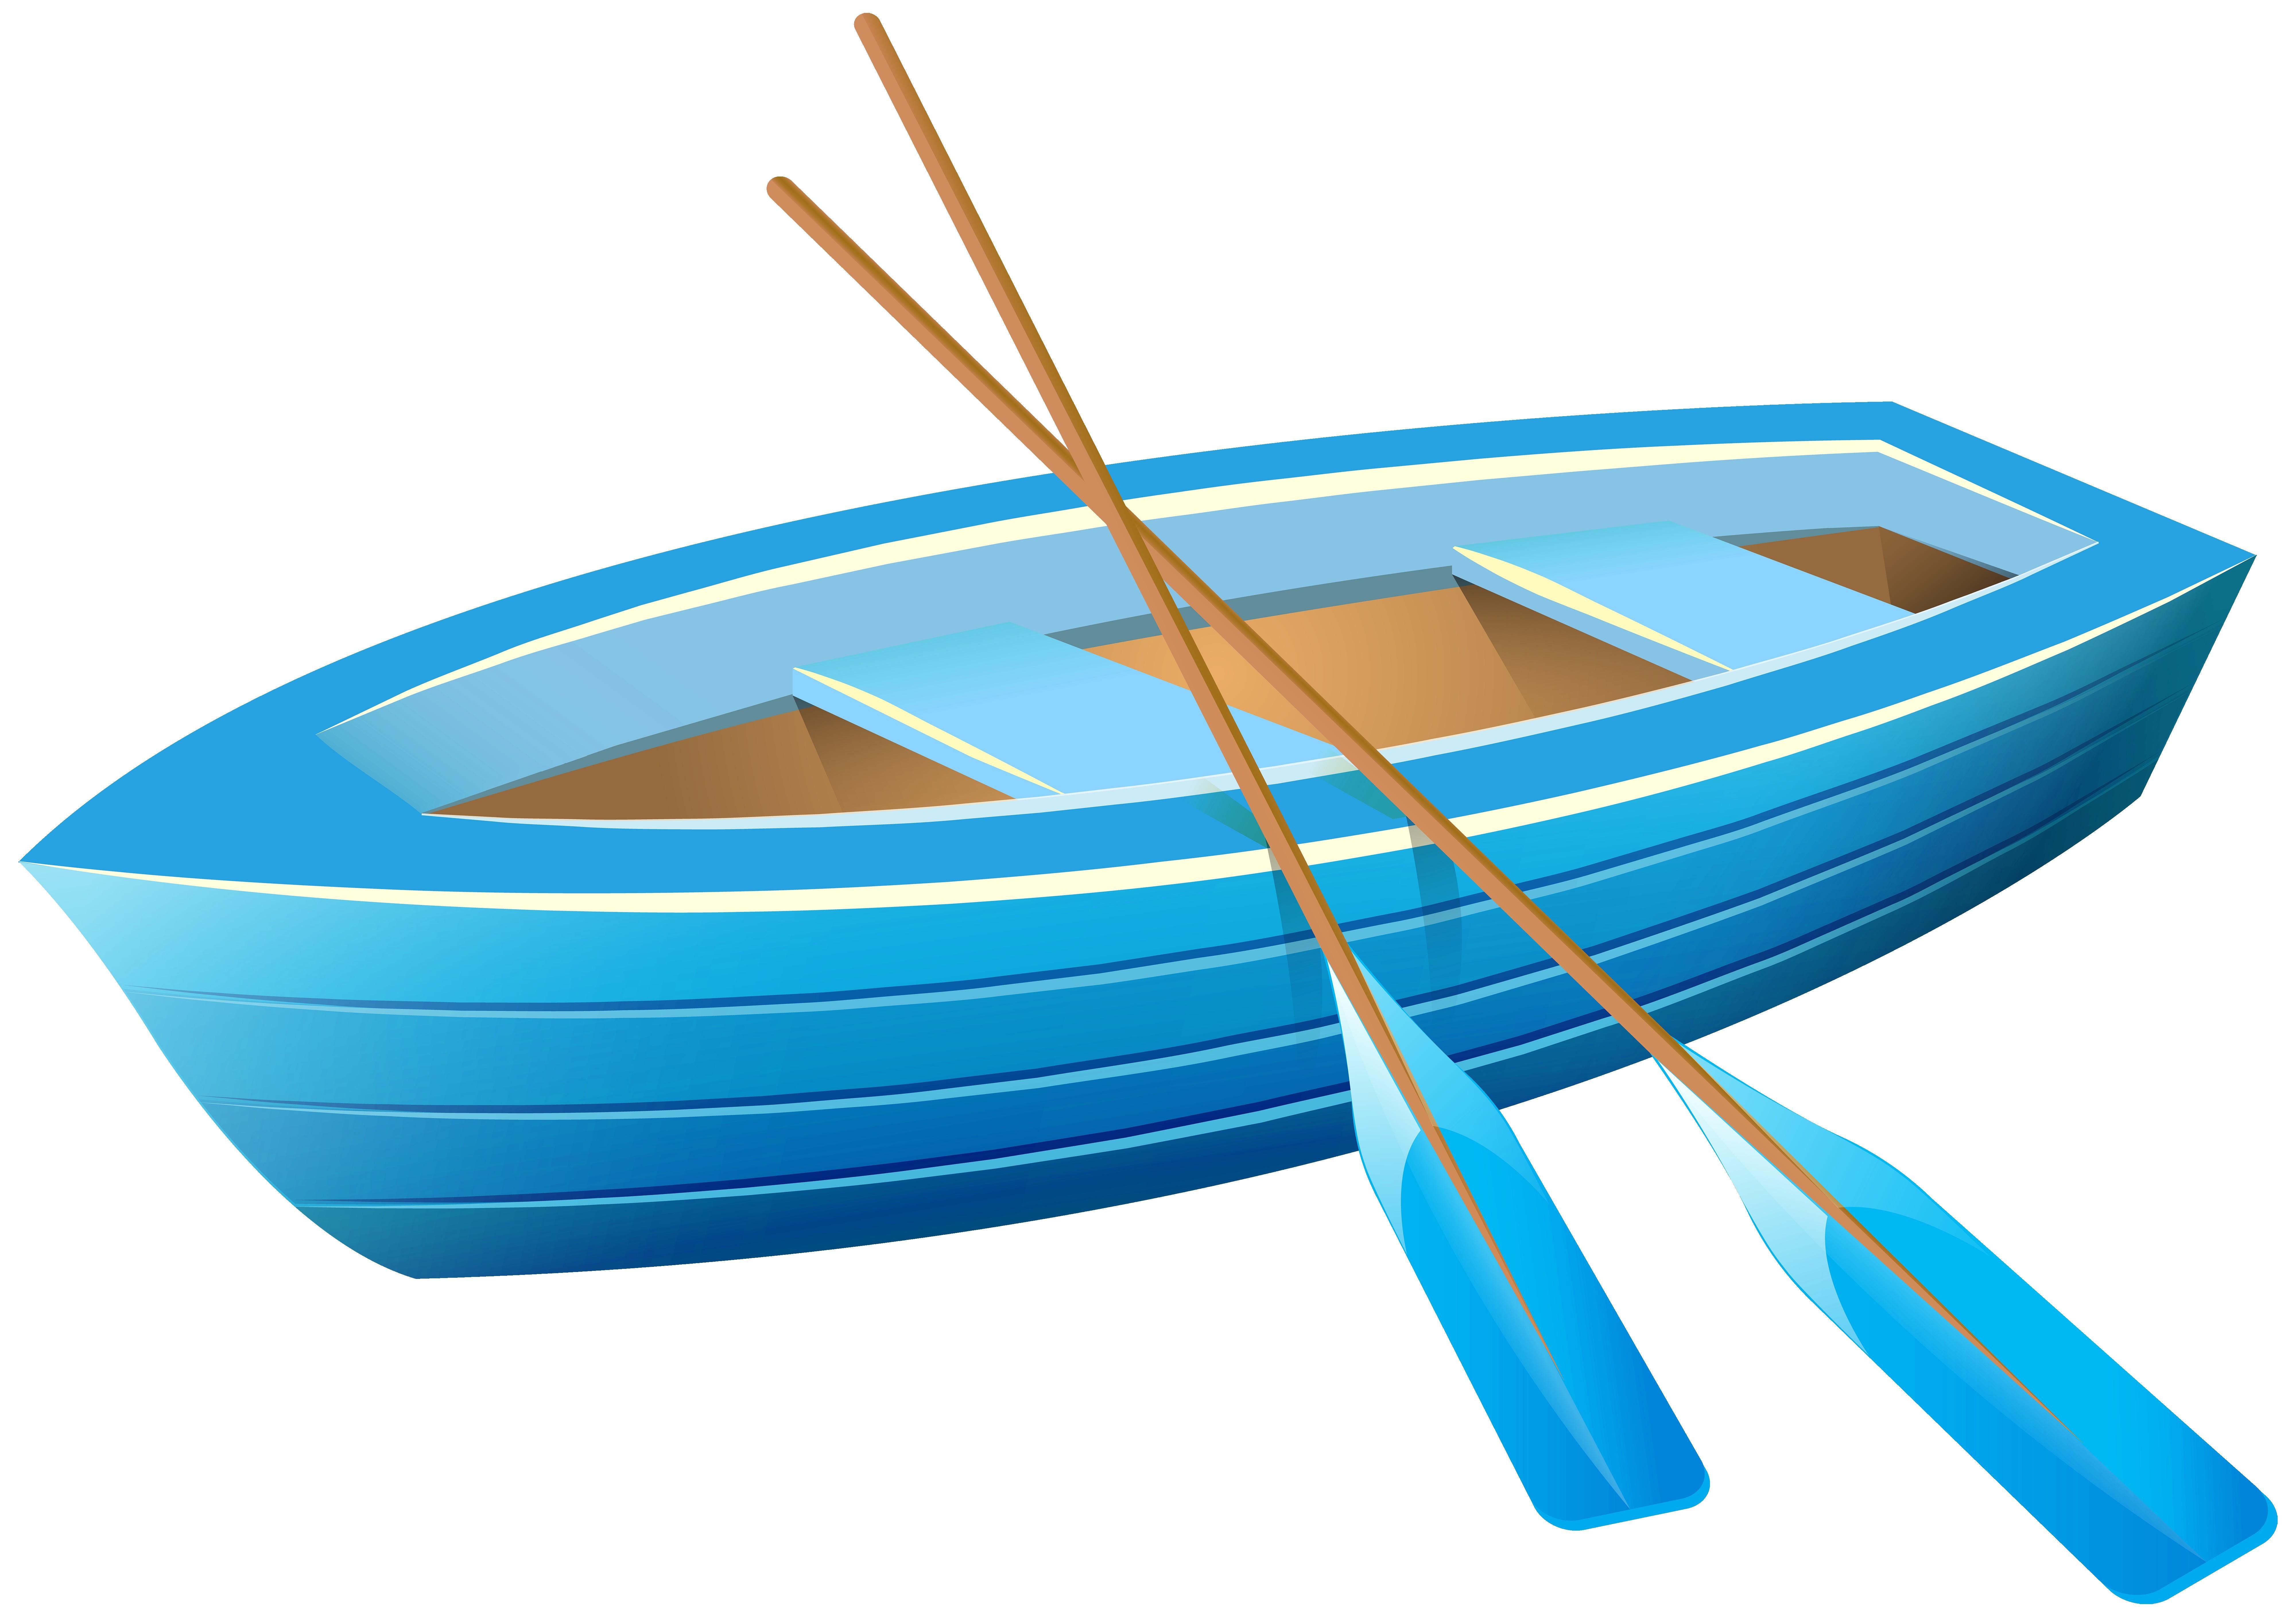 Boat Clipart Png | juliasmitheppsteiner.me